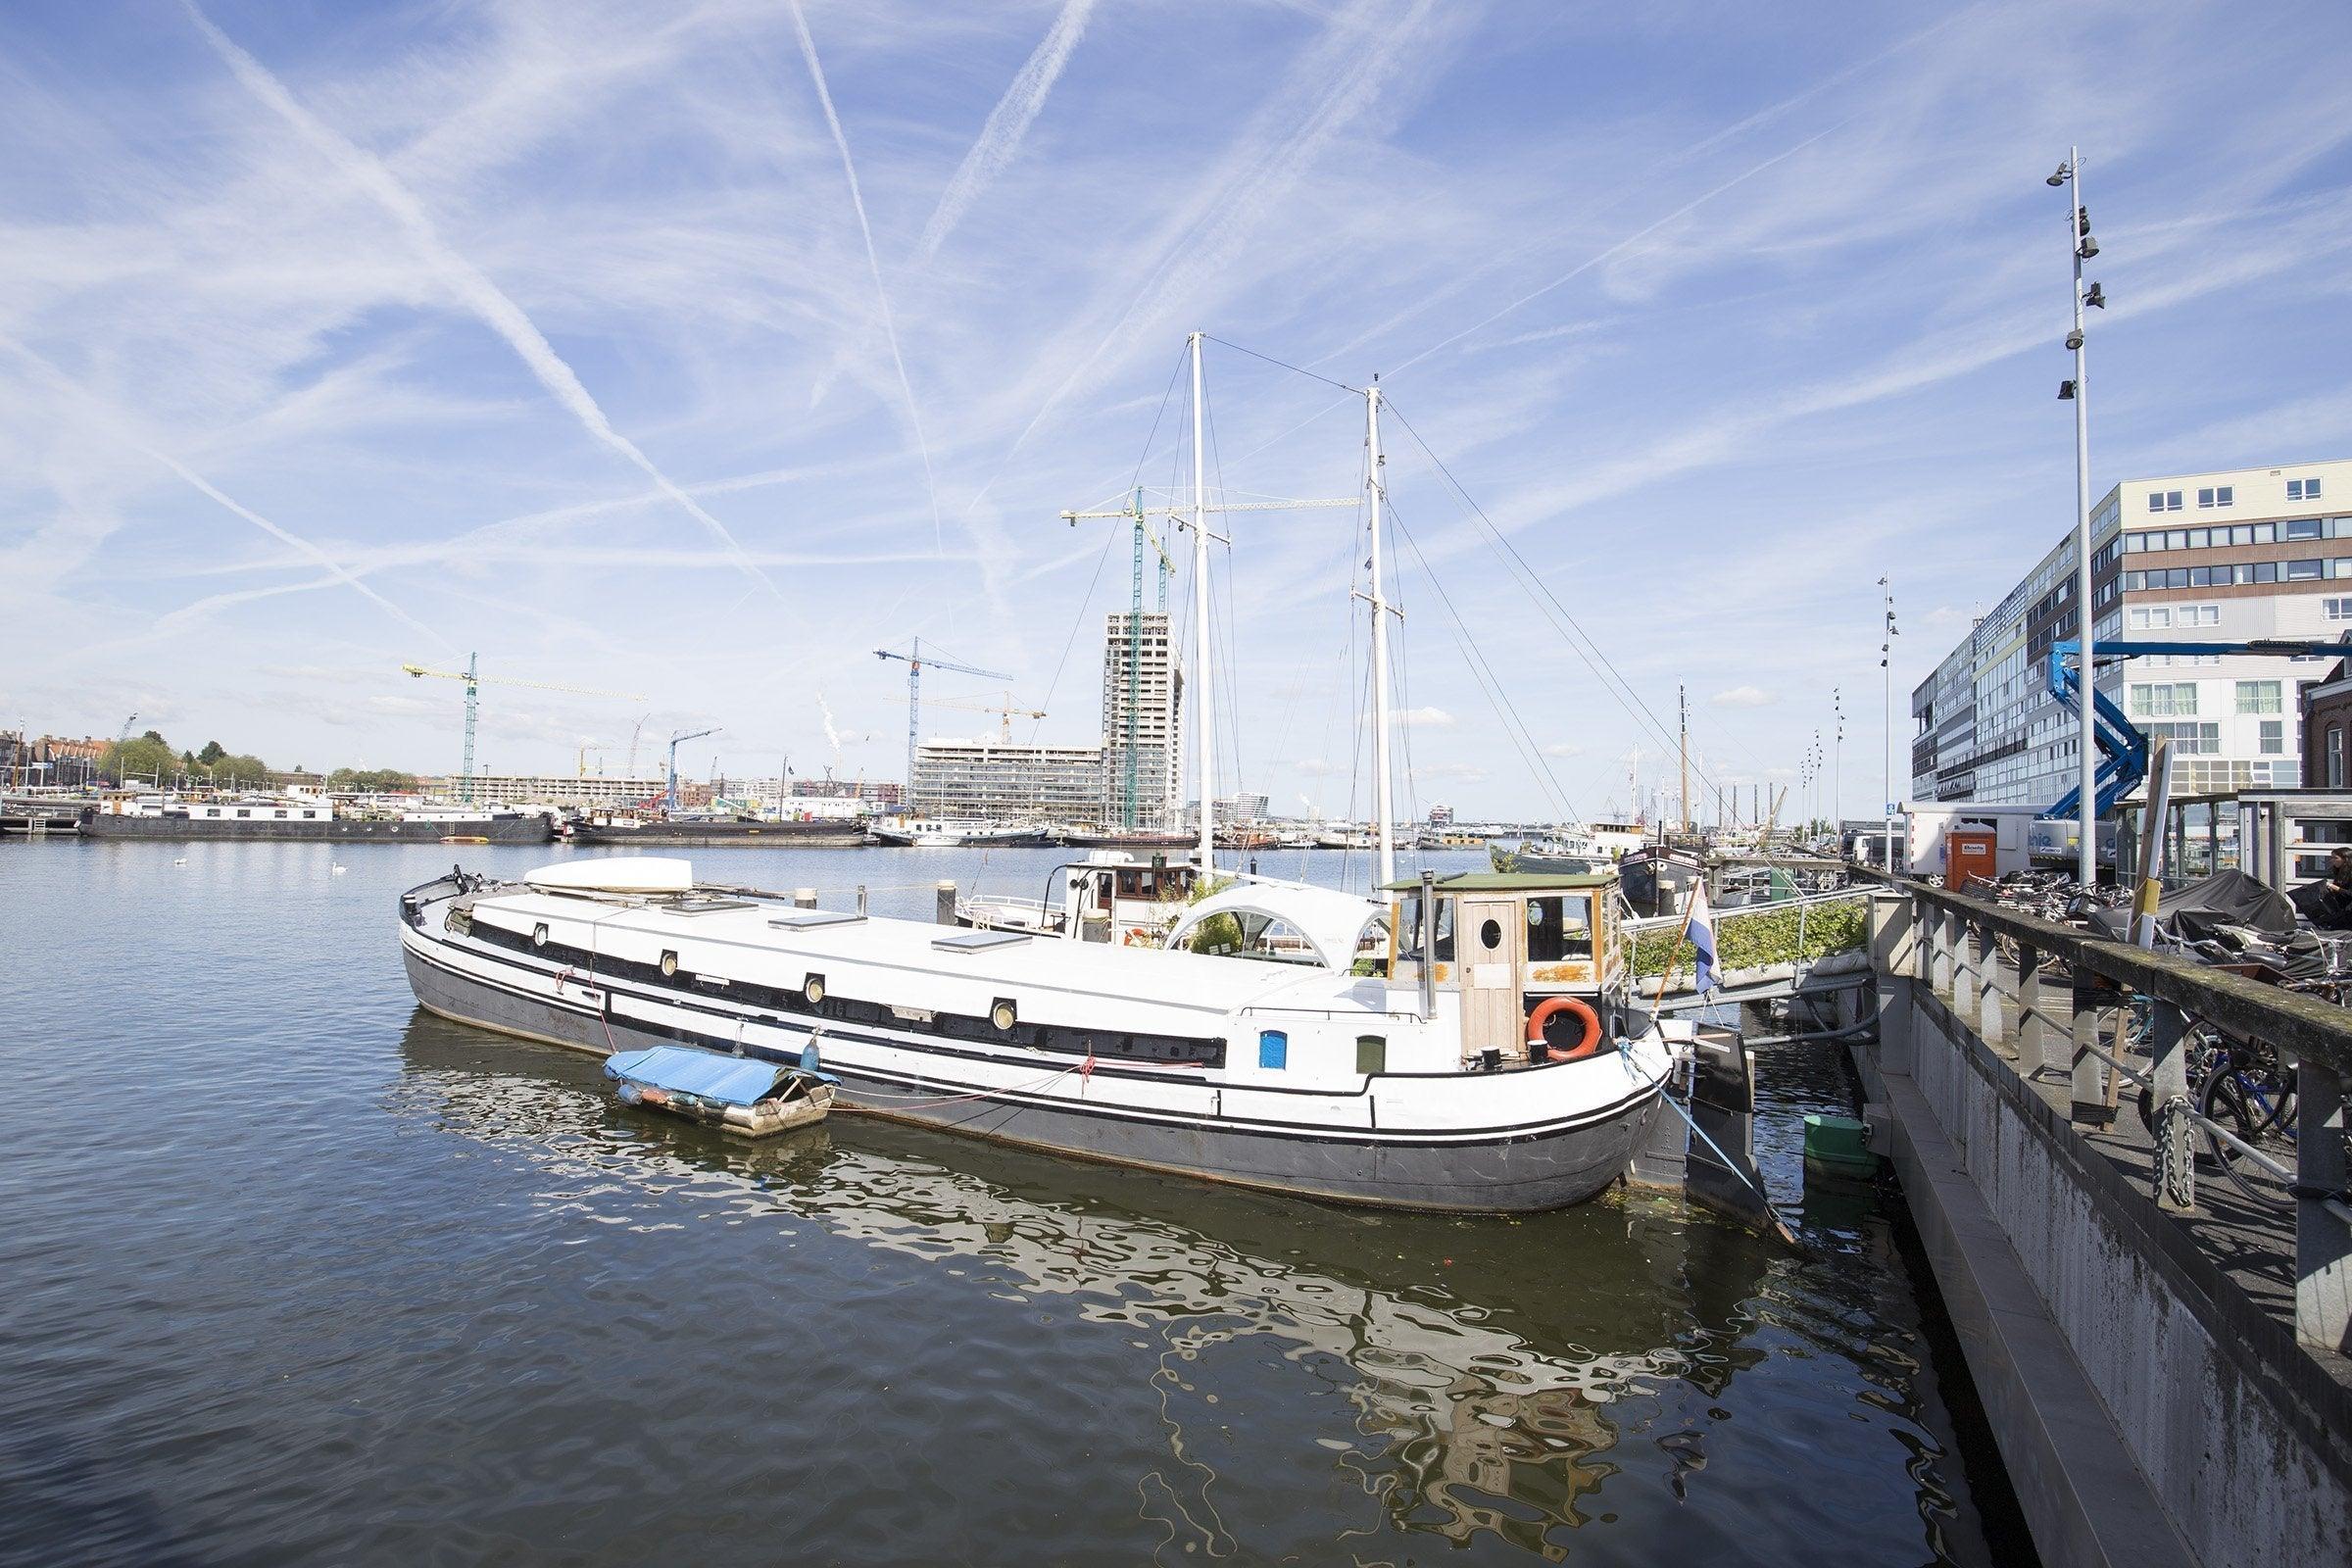 https://public.parariusoffice.nl/15/photos/huge/51292607.1500298127-751.jpg